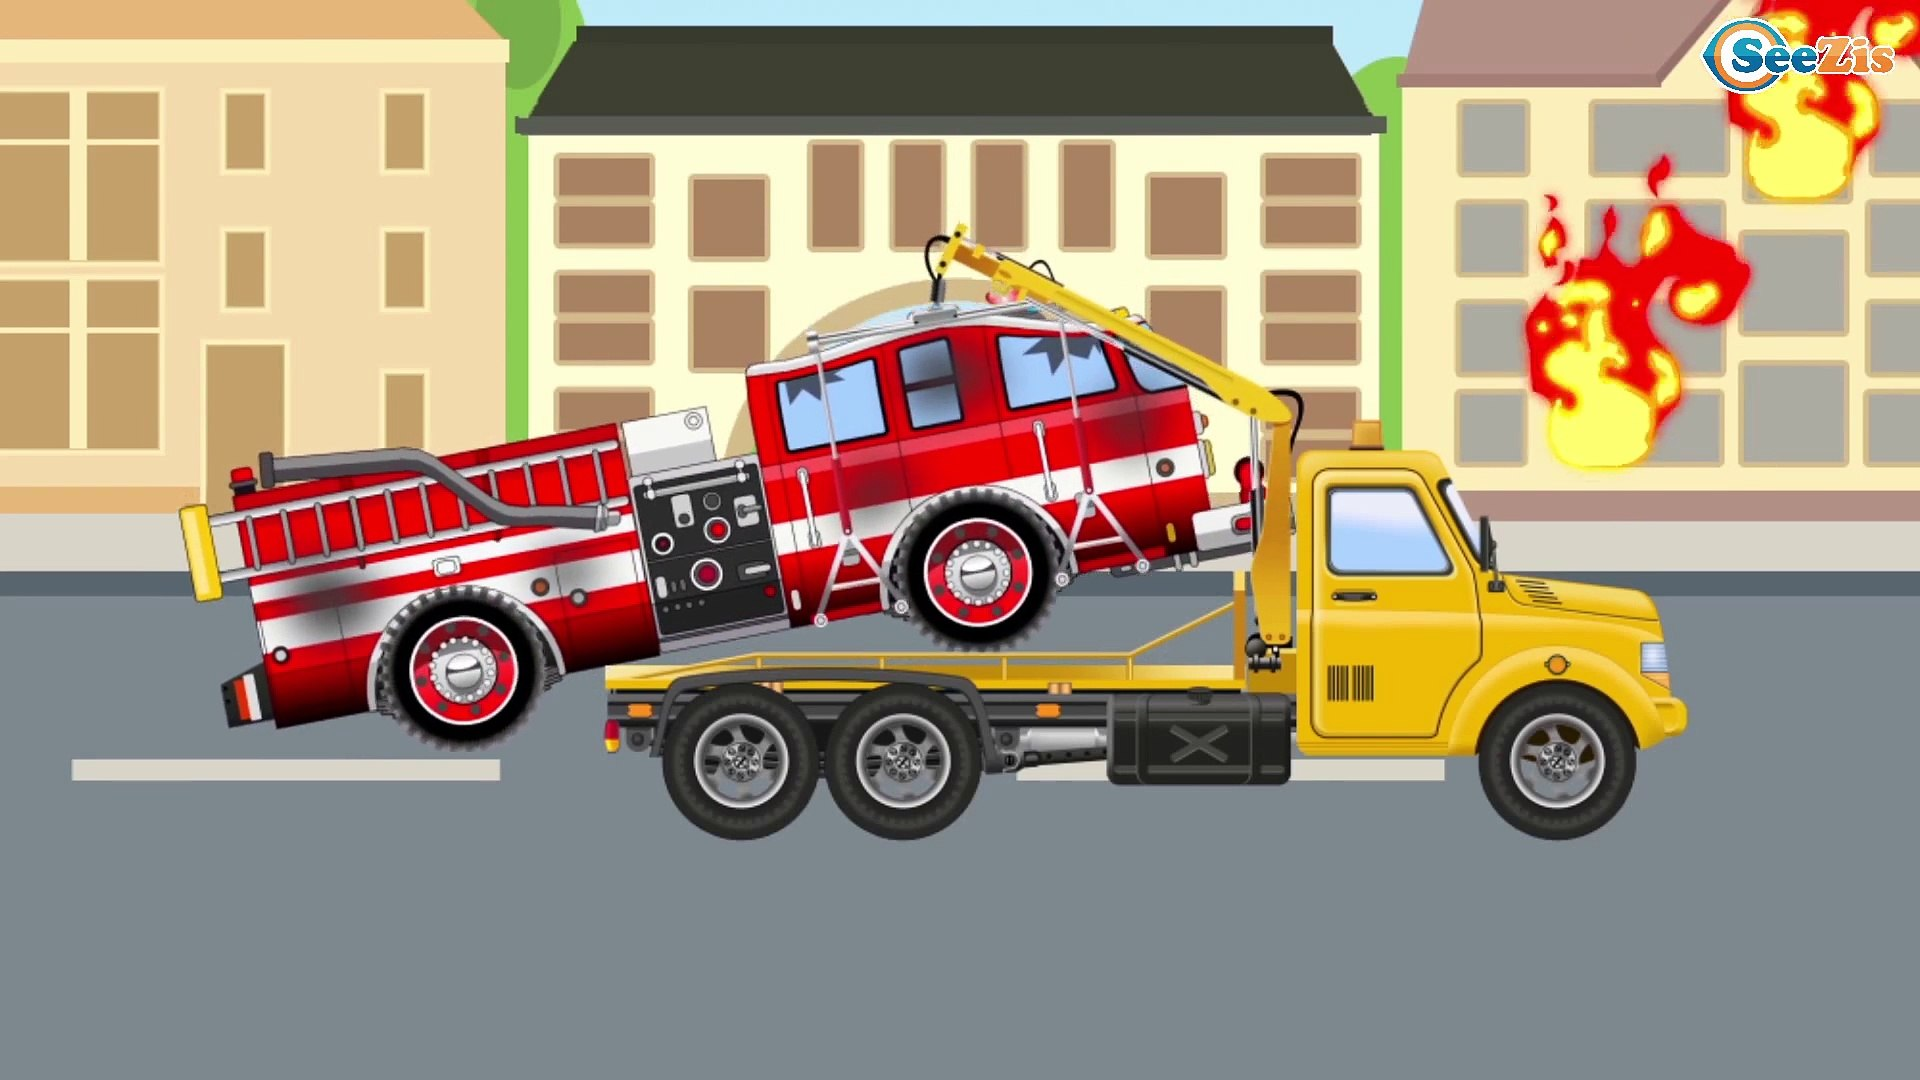 Camion De Pompier Et Police Dessin Anime Heros De La Rue